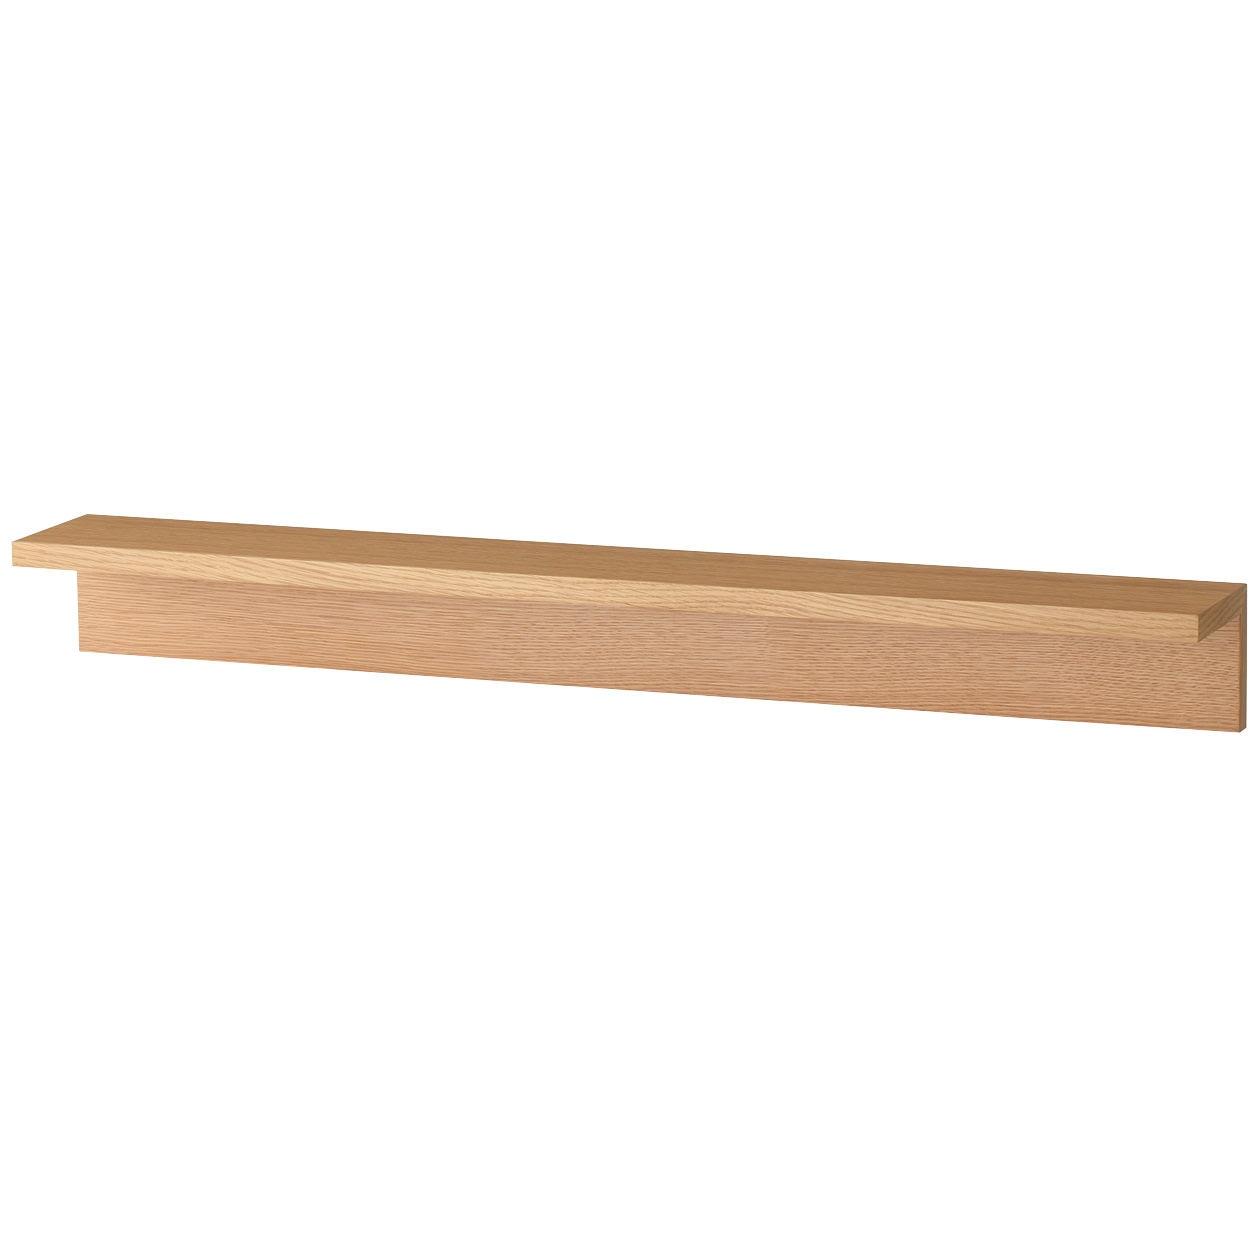 RoomClip商品情報 - 壁に付けられる家具・棚・幅88cm・オーク材